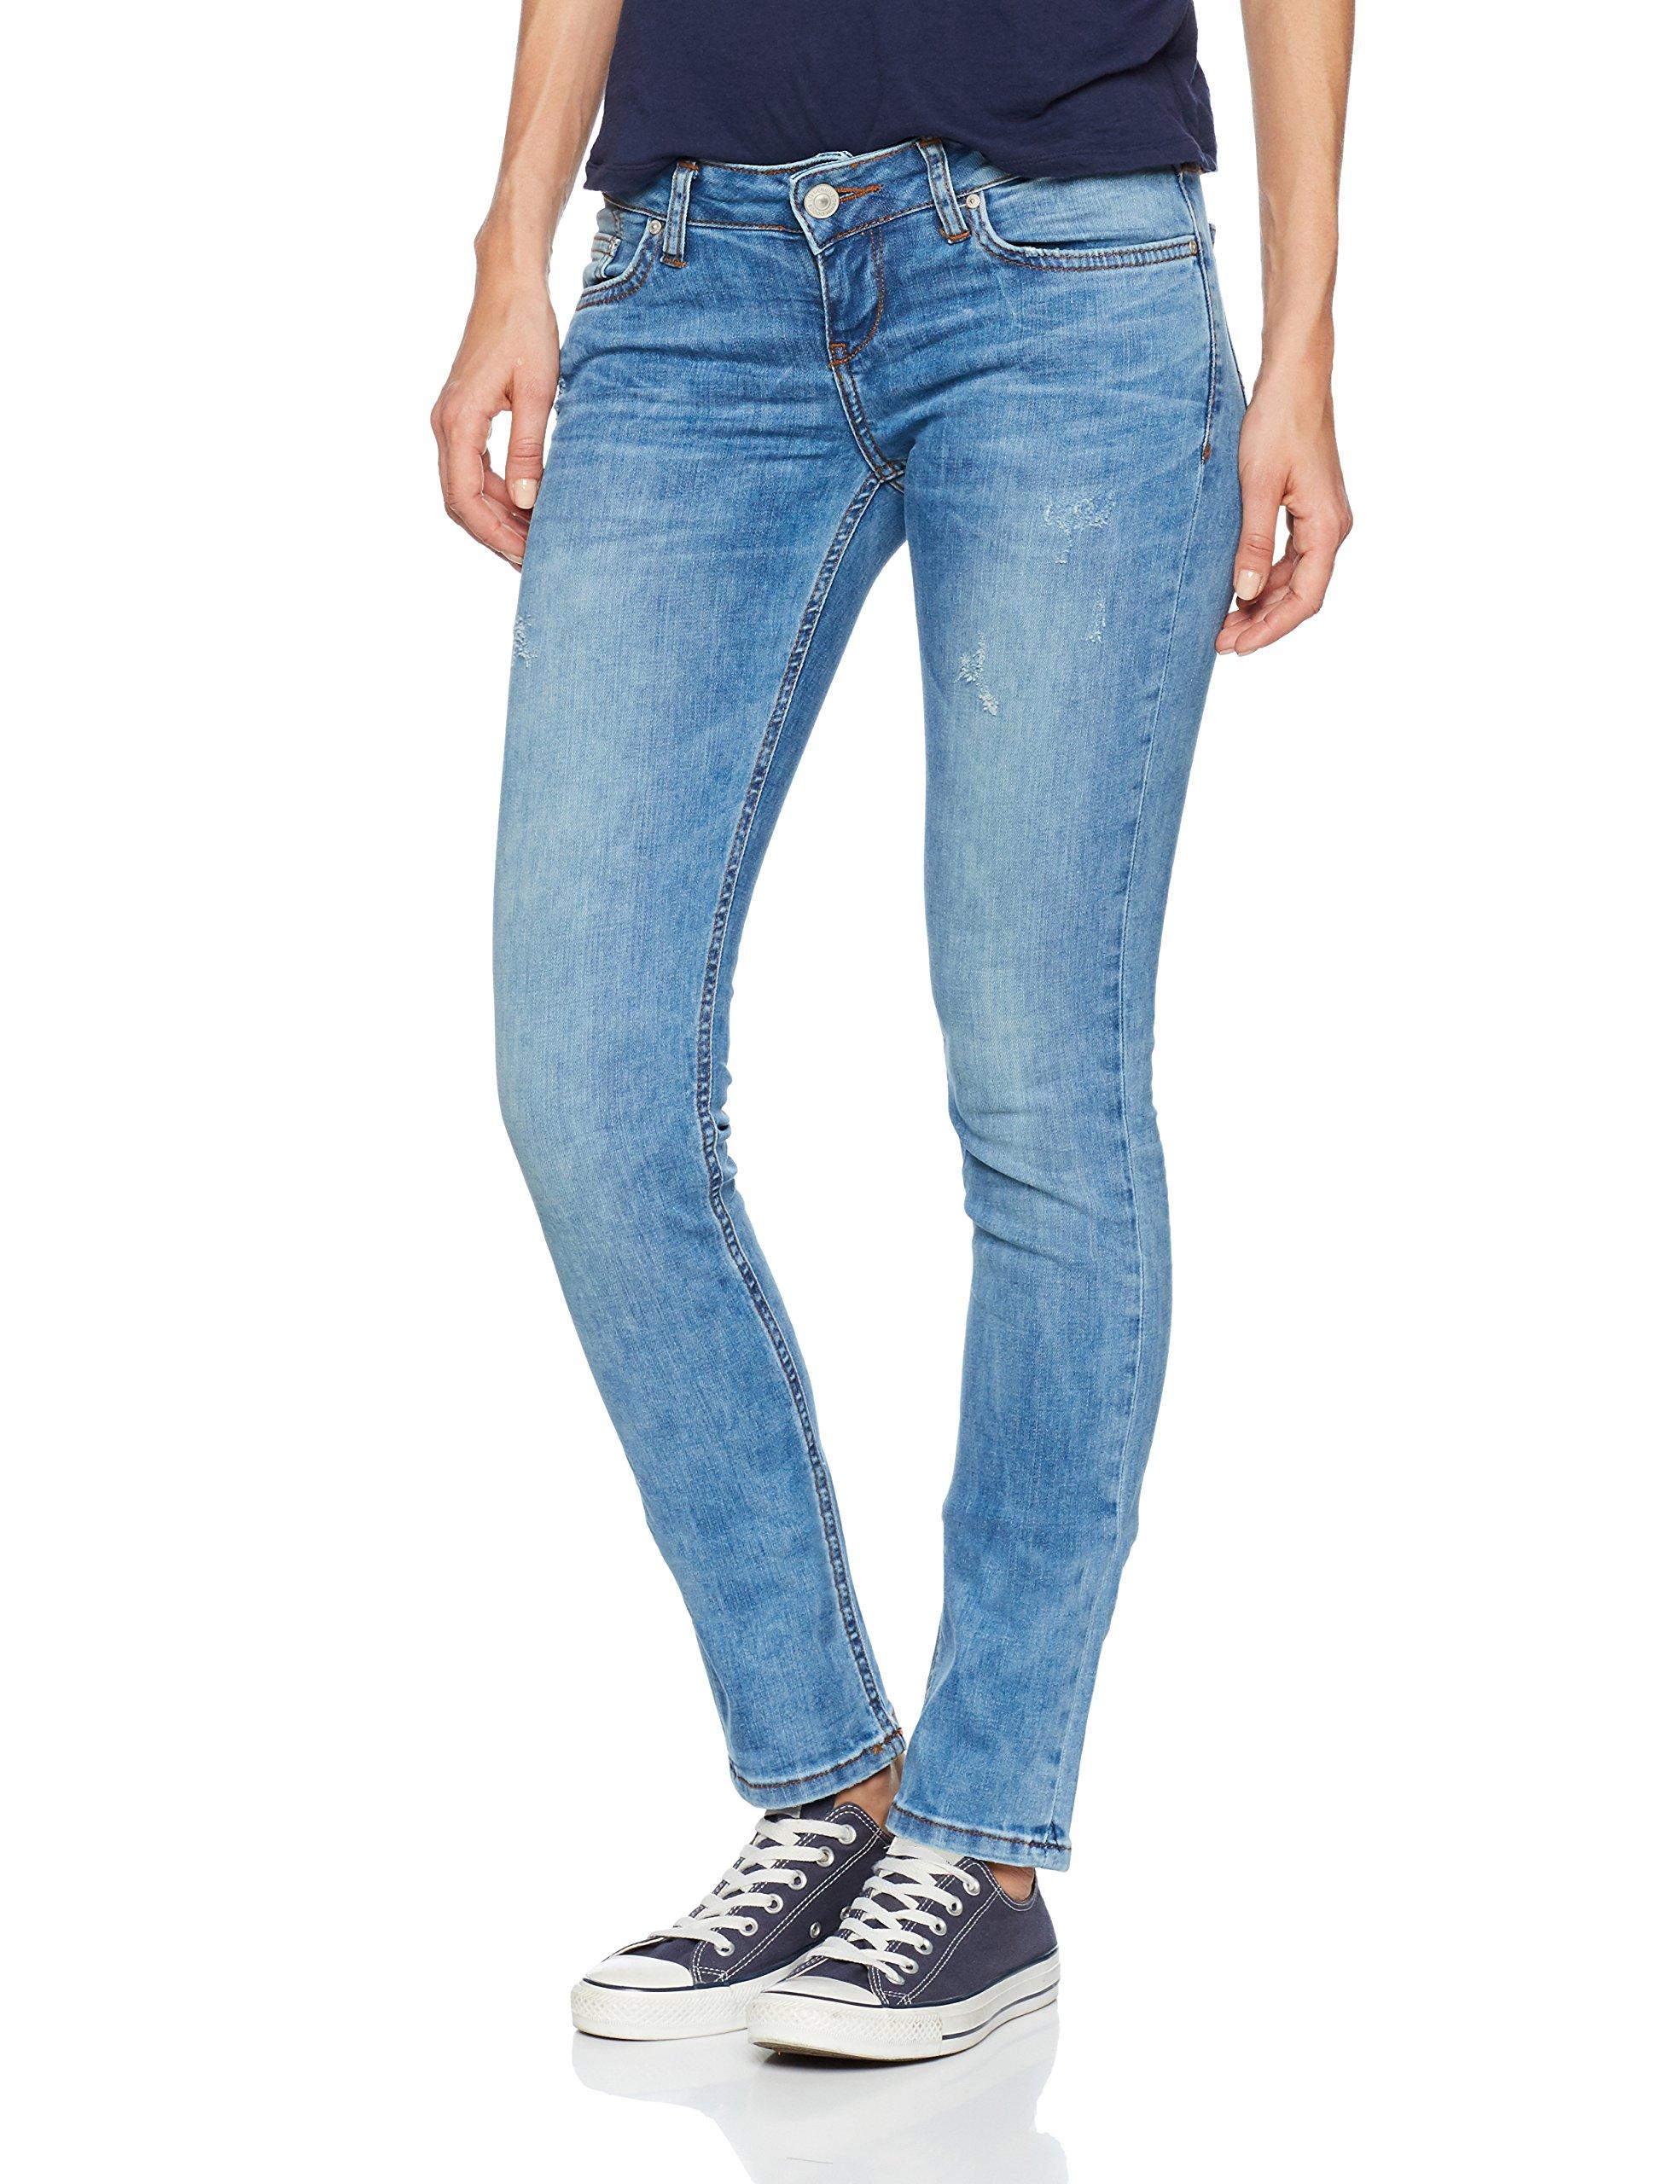 DroitBlauaurra Femme Jeans Aspen Wash Ltb 50663W27 l35 Jean 0wPXnOZkN8